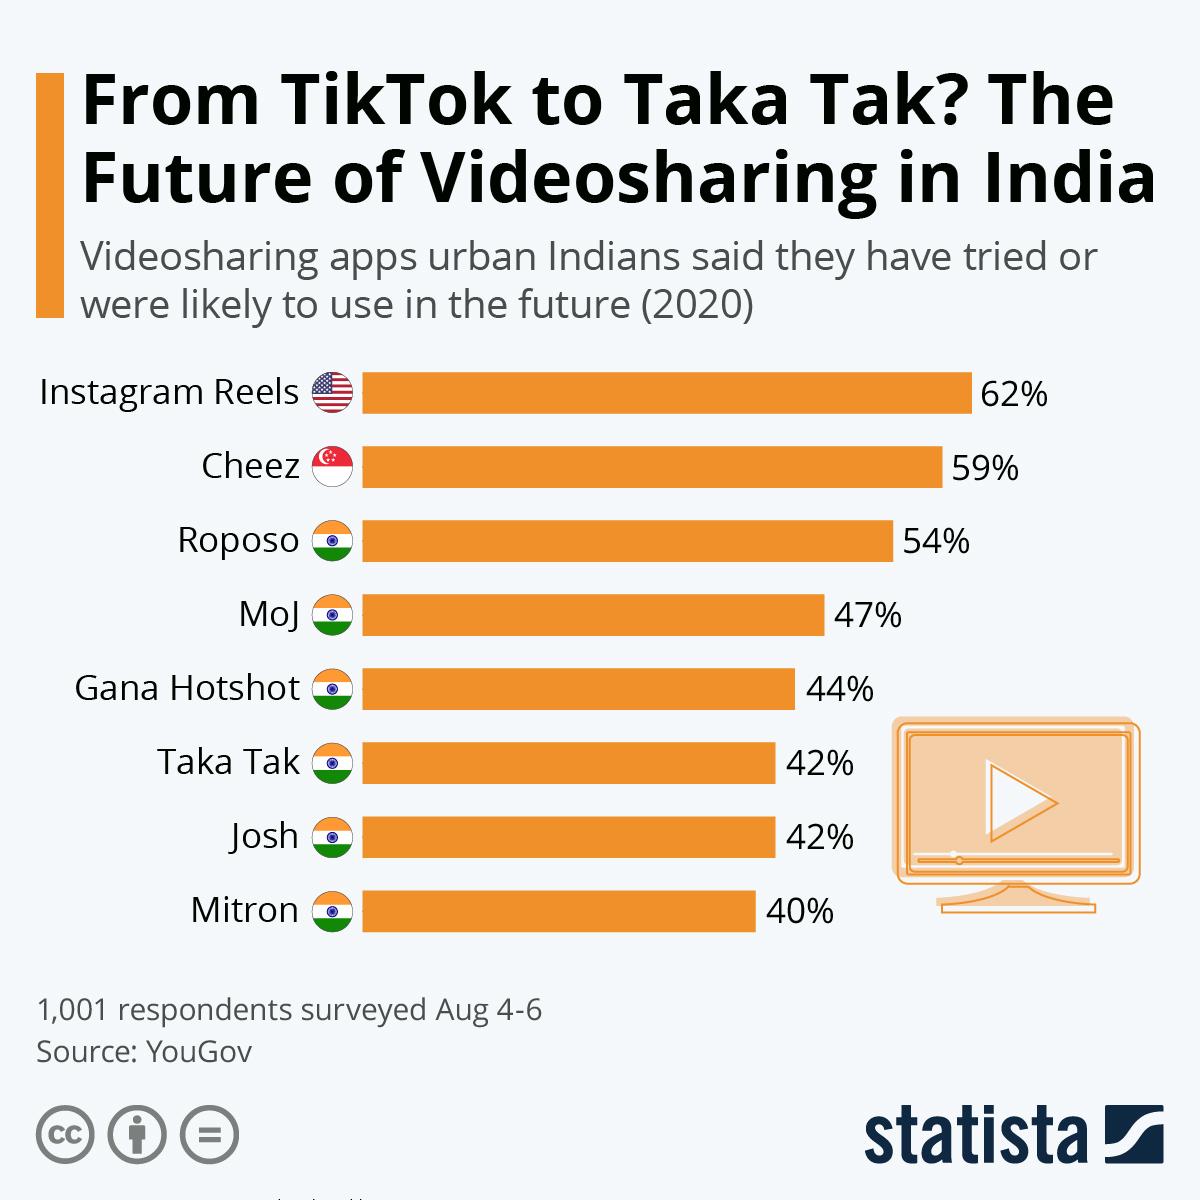 Infographic: From TikTok to Taka Tak? The Future of Videosharing in India | Statista